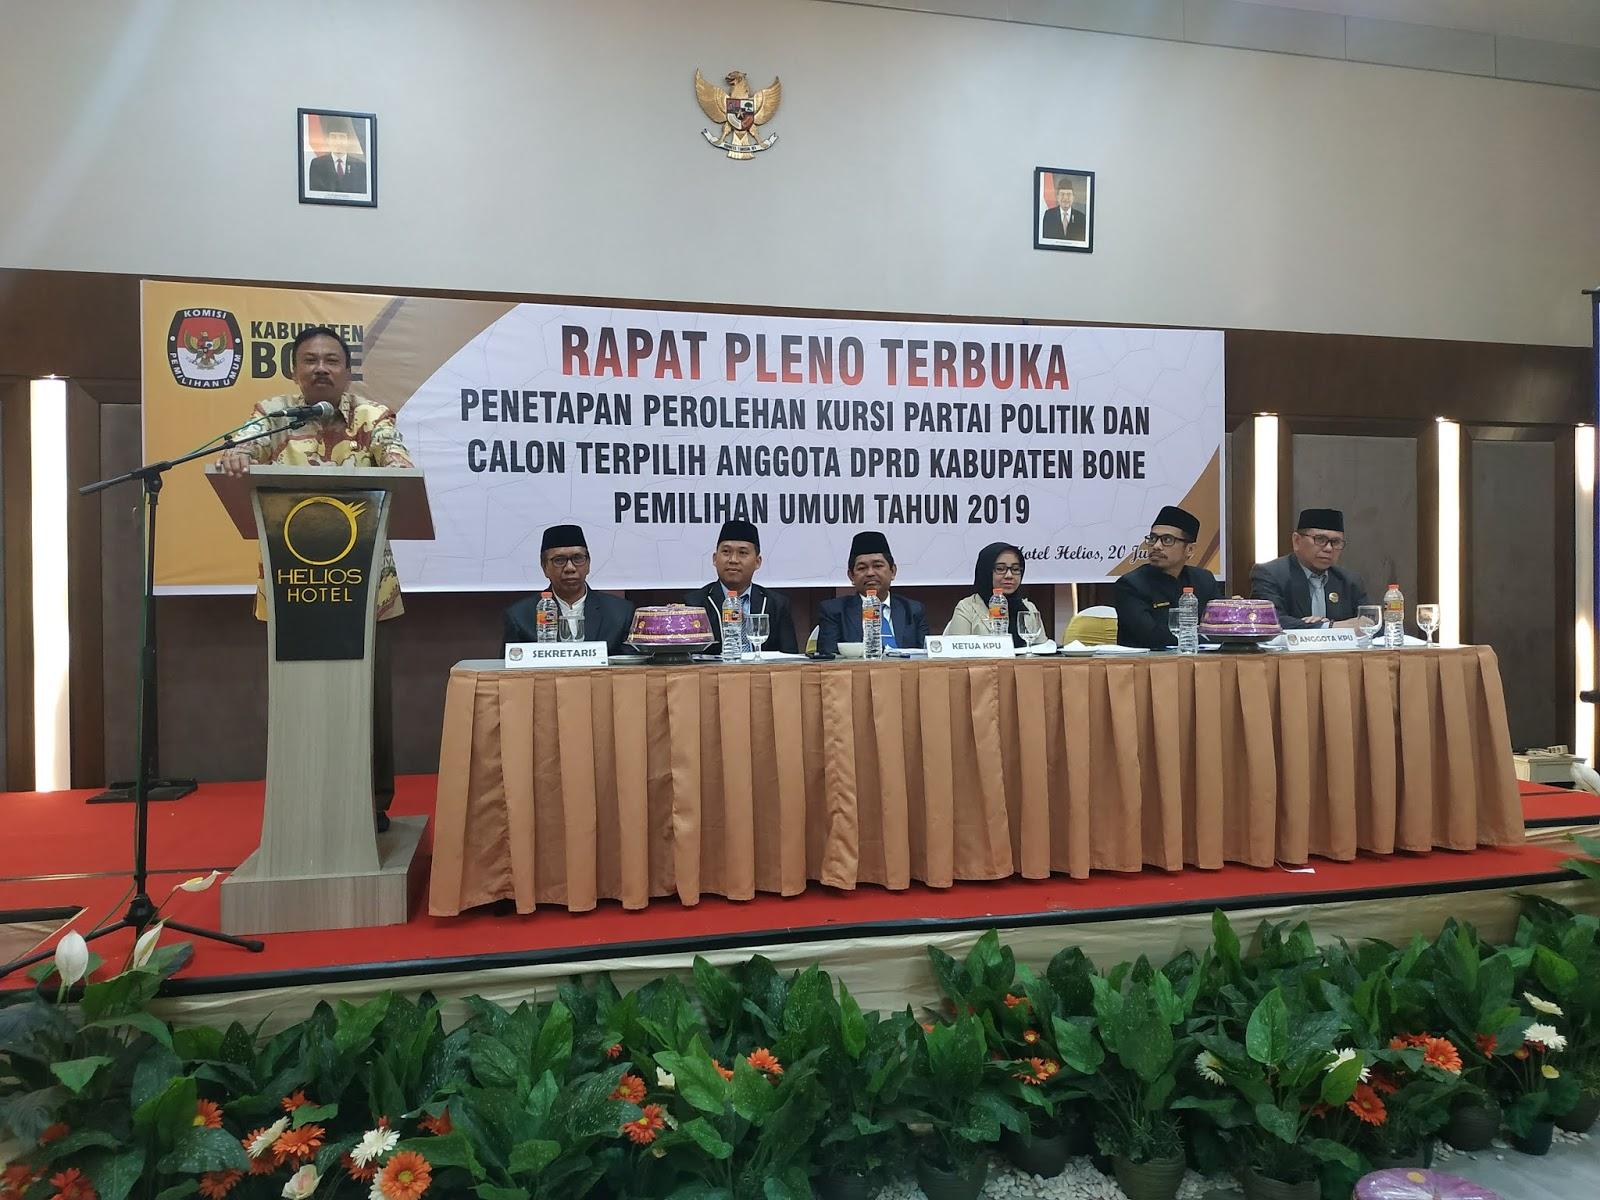 Saksi Parpol Terima Hasil, Rapat Pleno Terbuka KPU Kabupaten Bone Berjalan Lancar